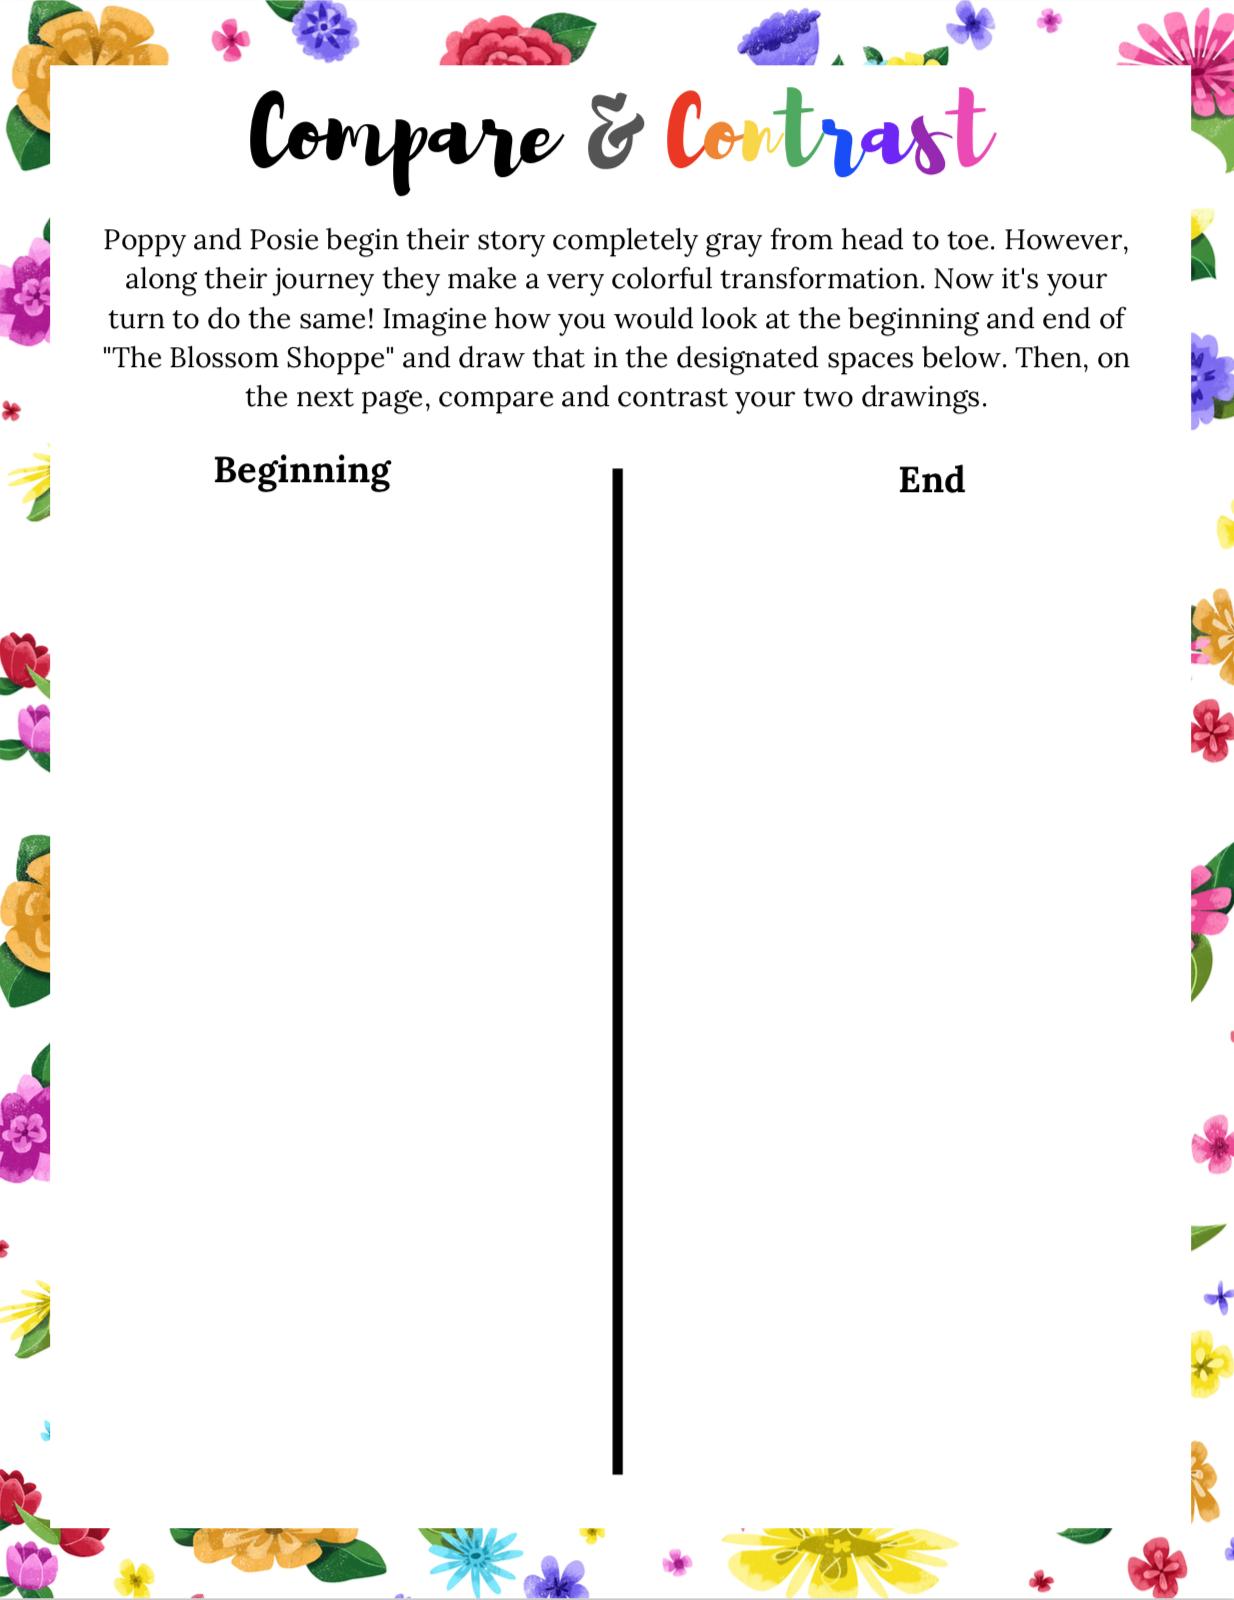 Poppy & Posie's Compare & Contrast Printable Activity - The Blossom Shoppe